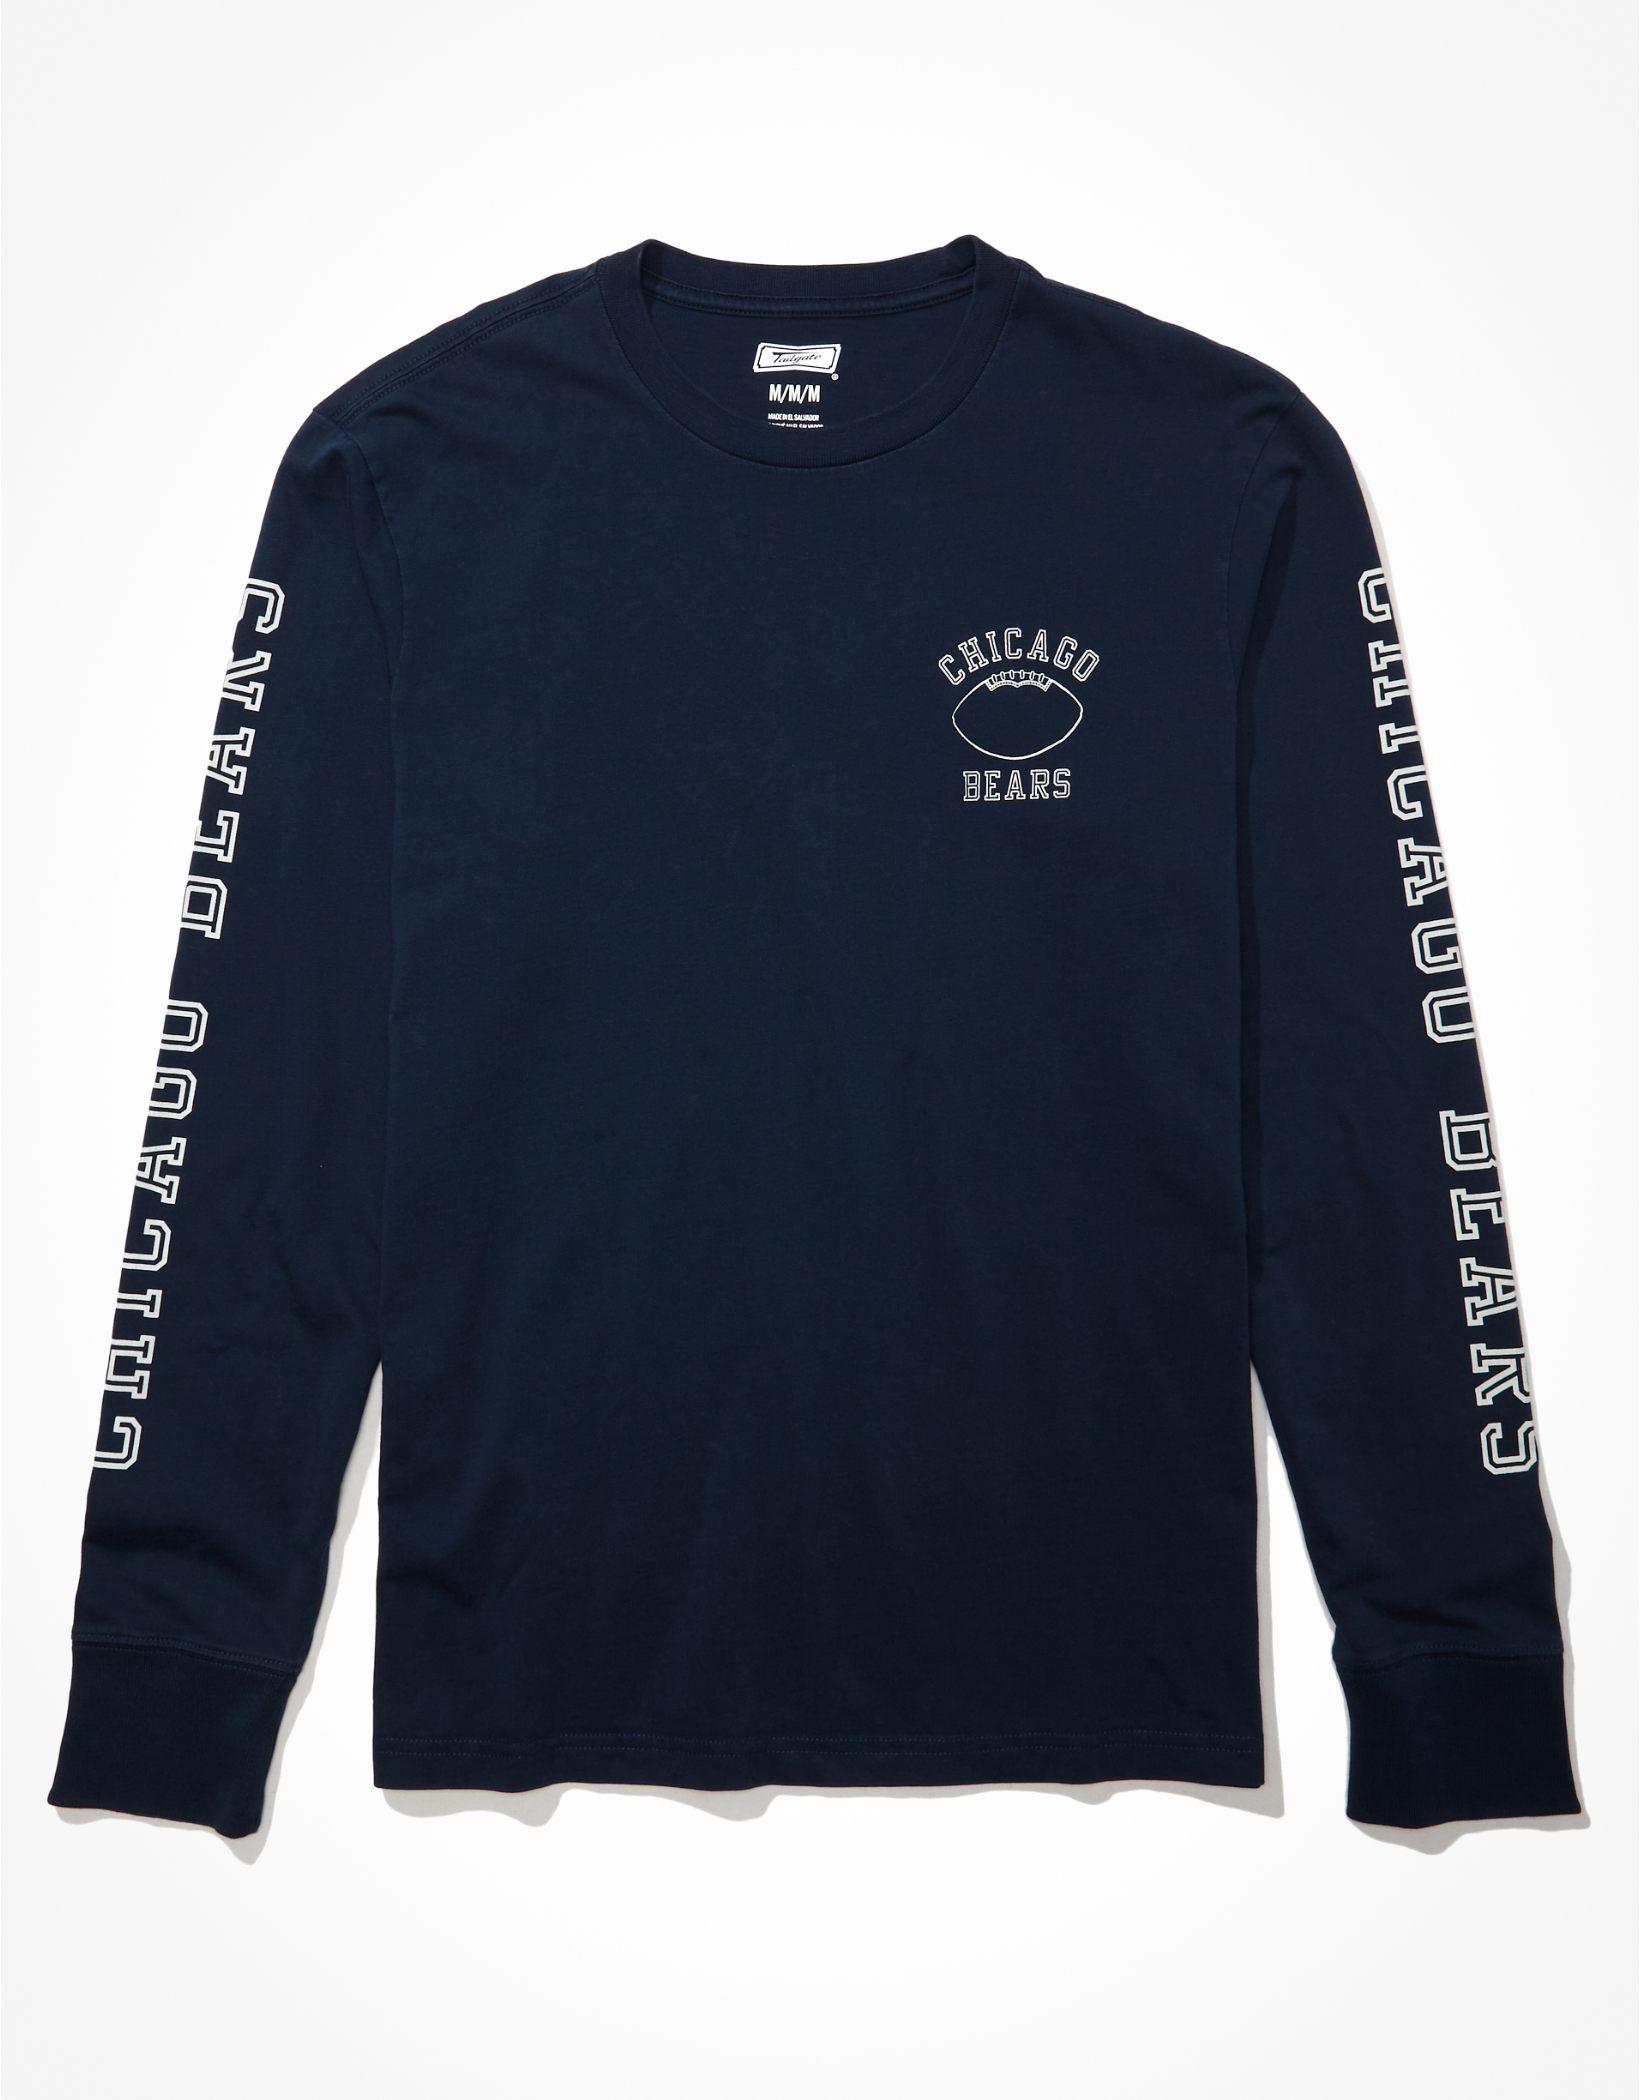 Tailgate Men's Chicago Bears Long-Sleeve Graphic T-Shirt